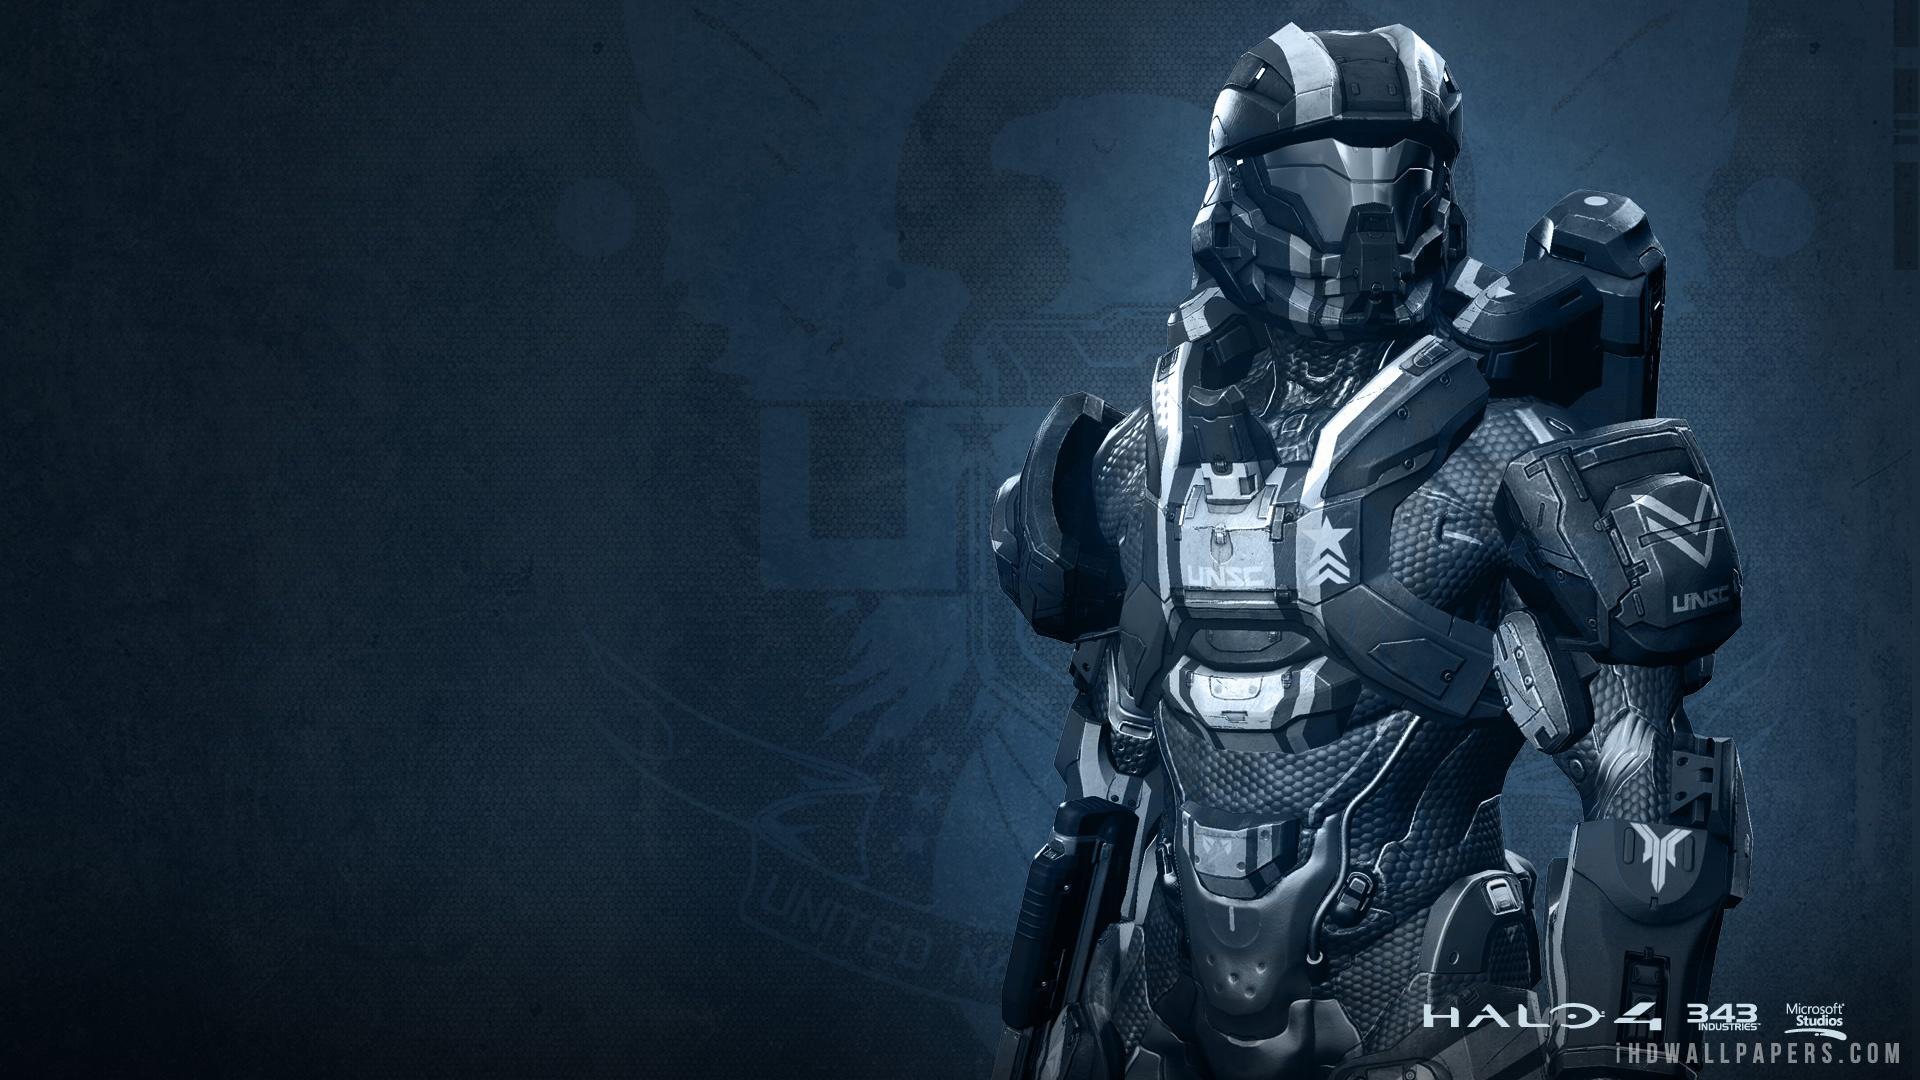 Halo 5 High Definition 1920x1080